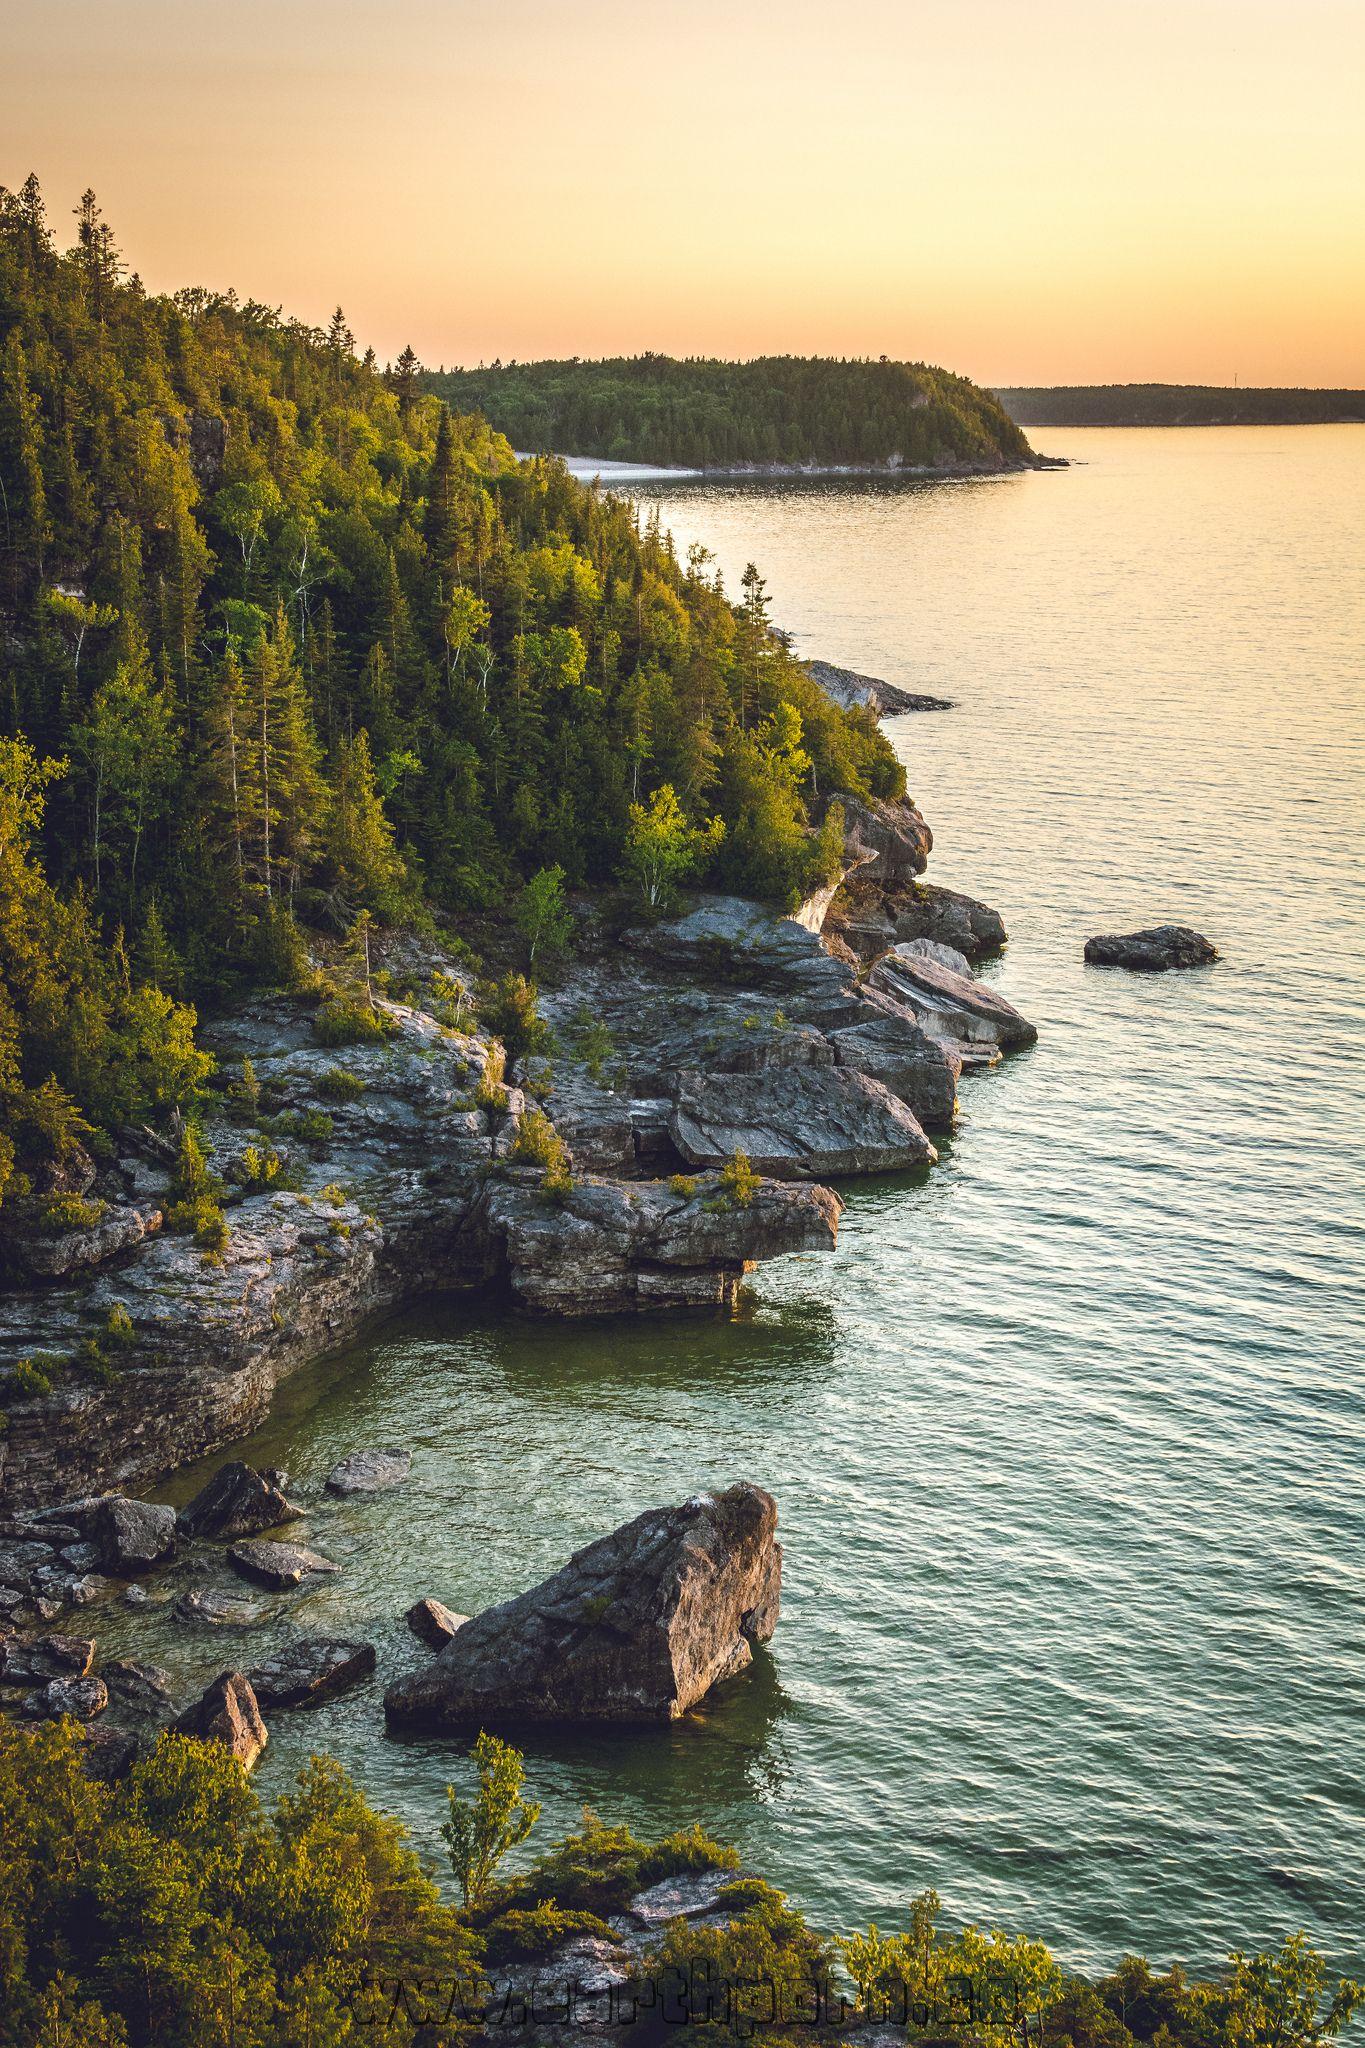 Canadas Best Travel Destinations: Victoria, Vancouver